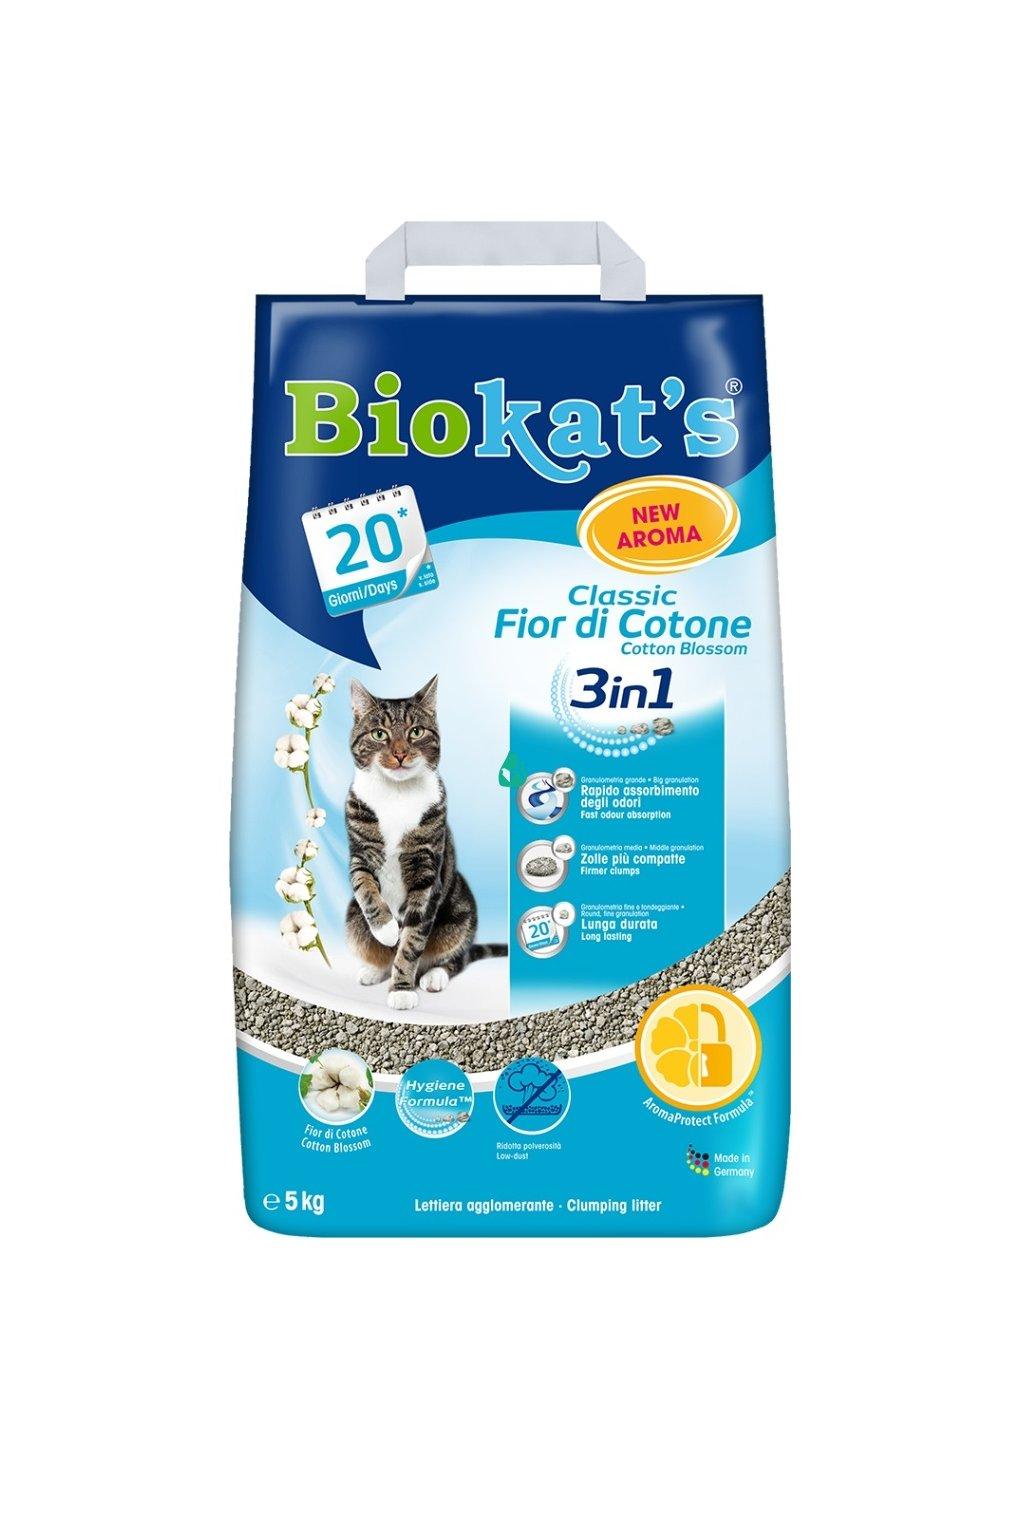 biokats classic fresh 3in1 cotton blossom 011jpg 95%